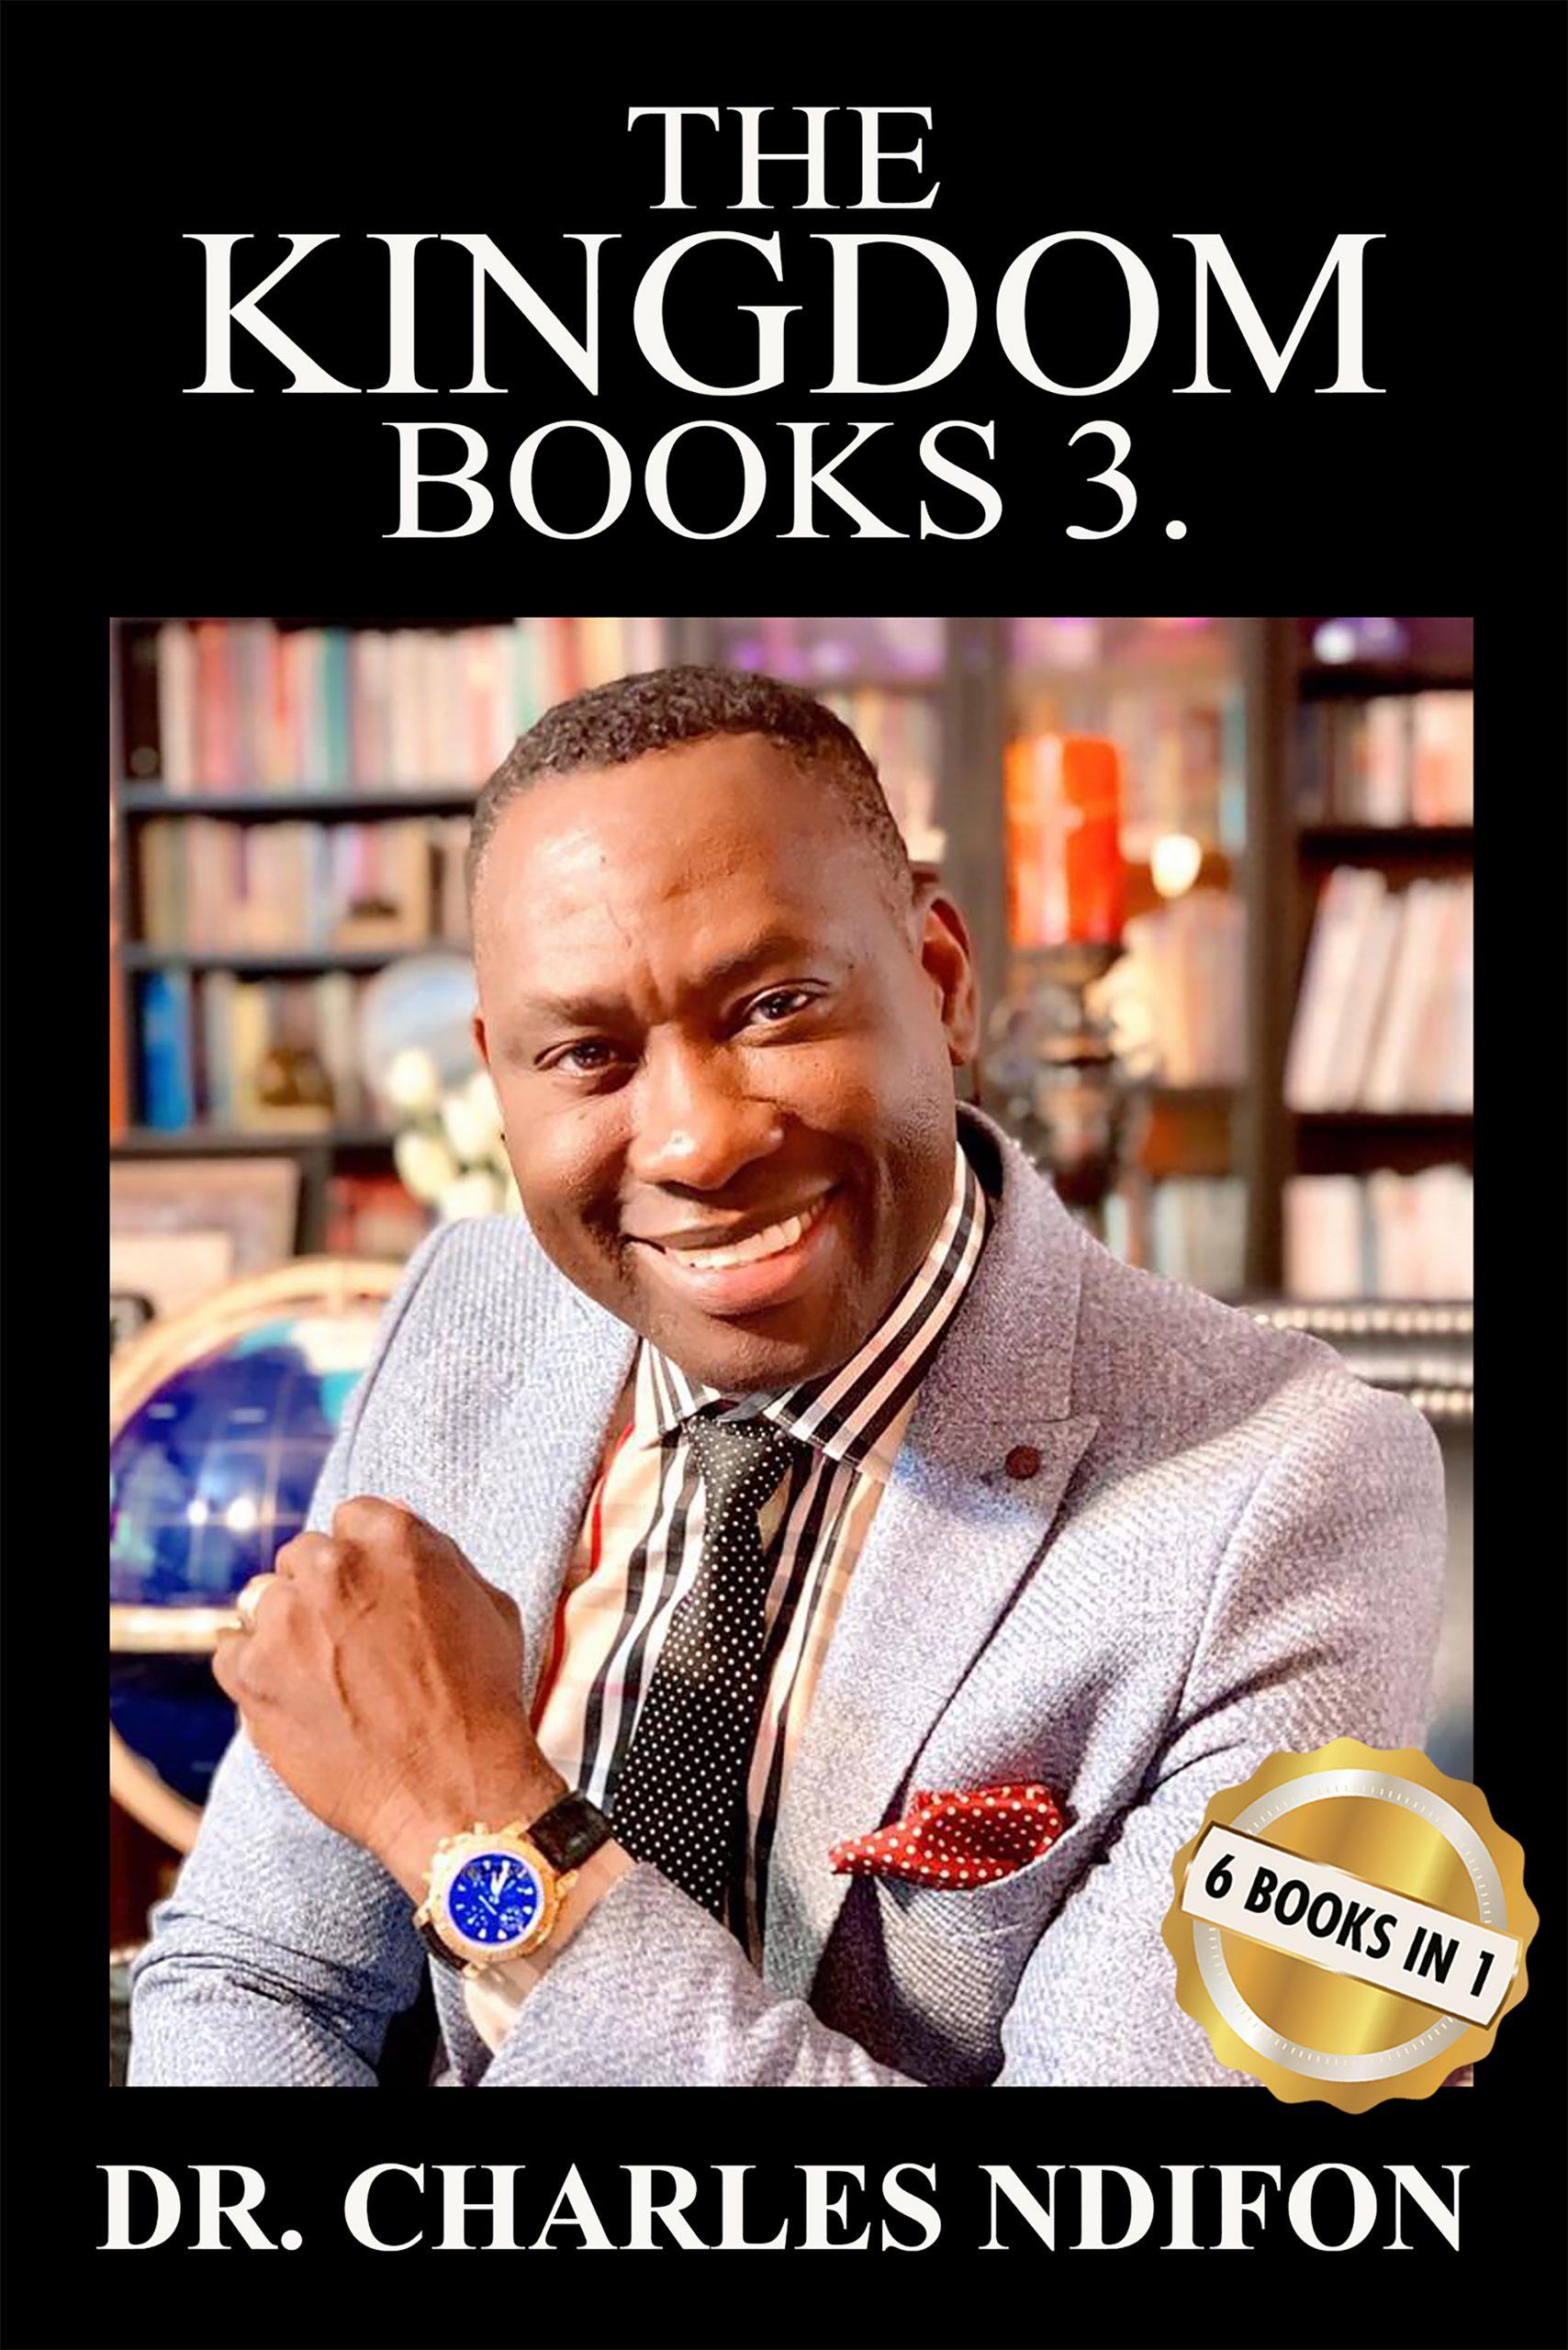 The Kingdom Books 3